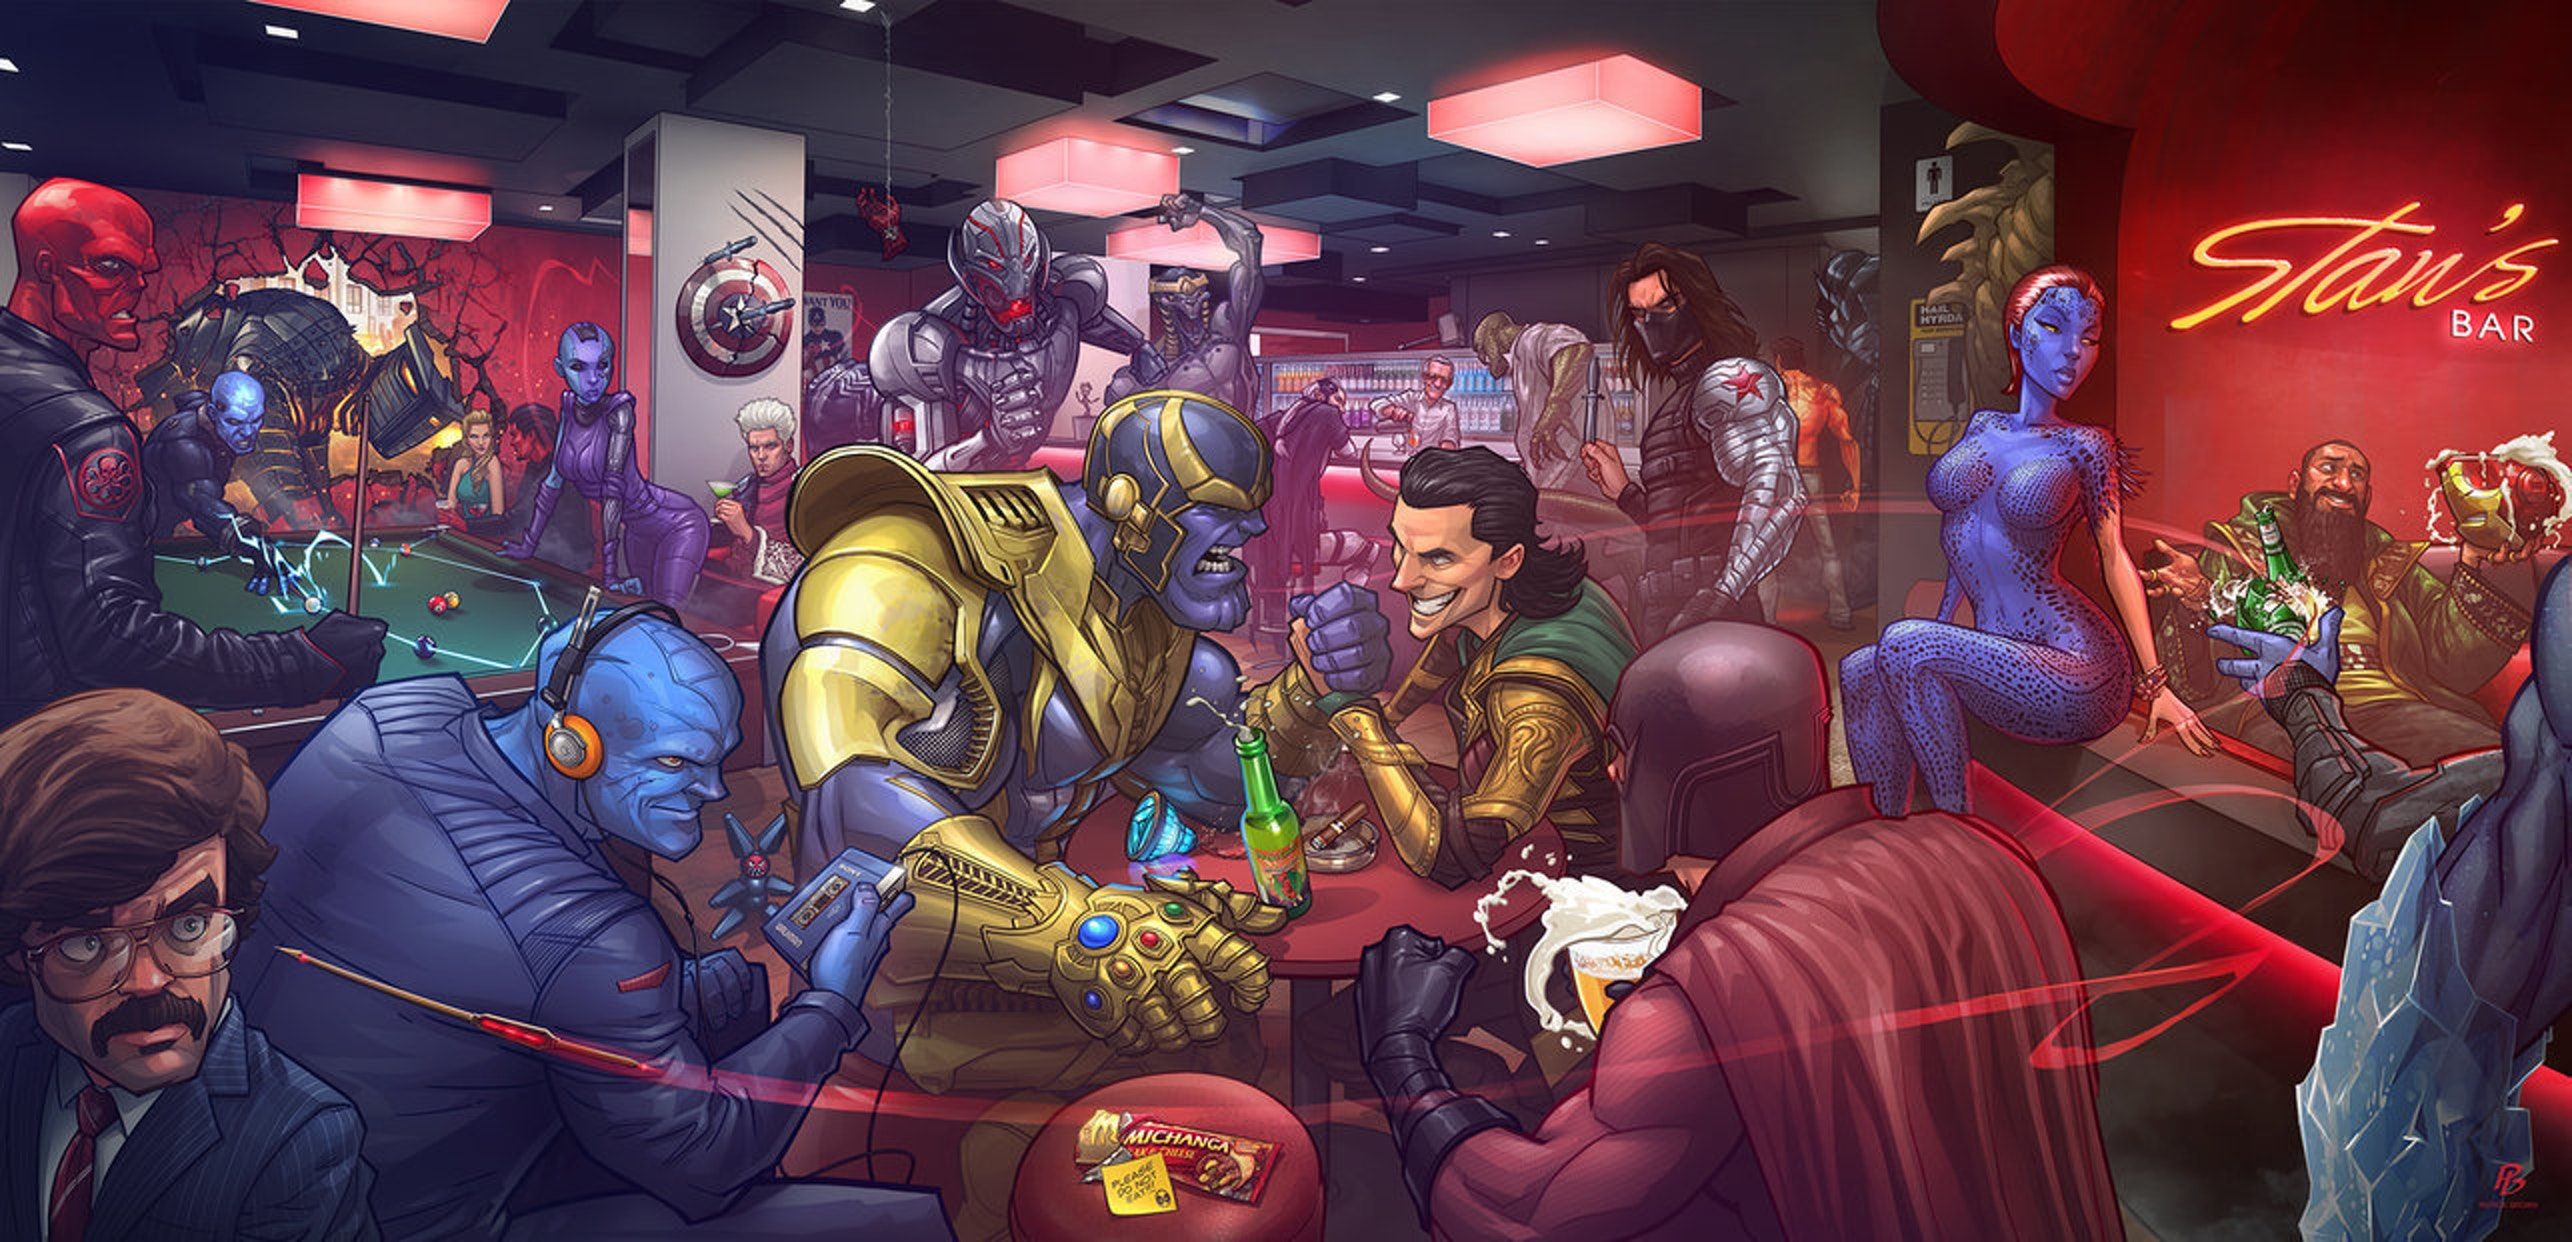 """Marvel Villains"" by Patrick Brown, DeviantArt"